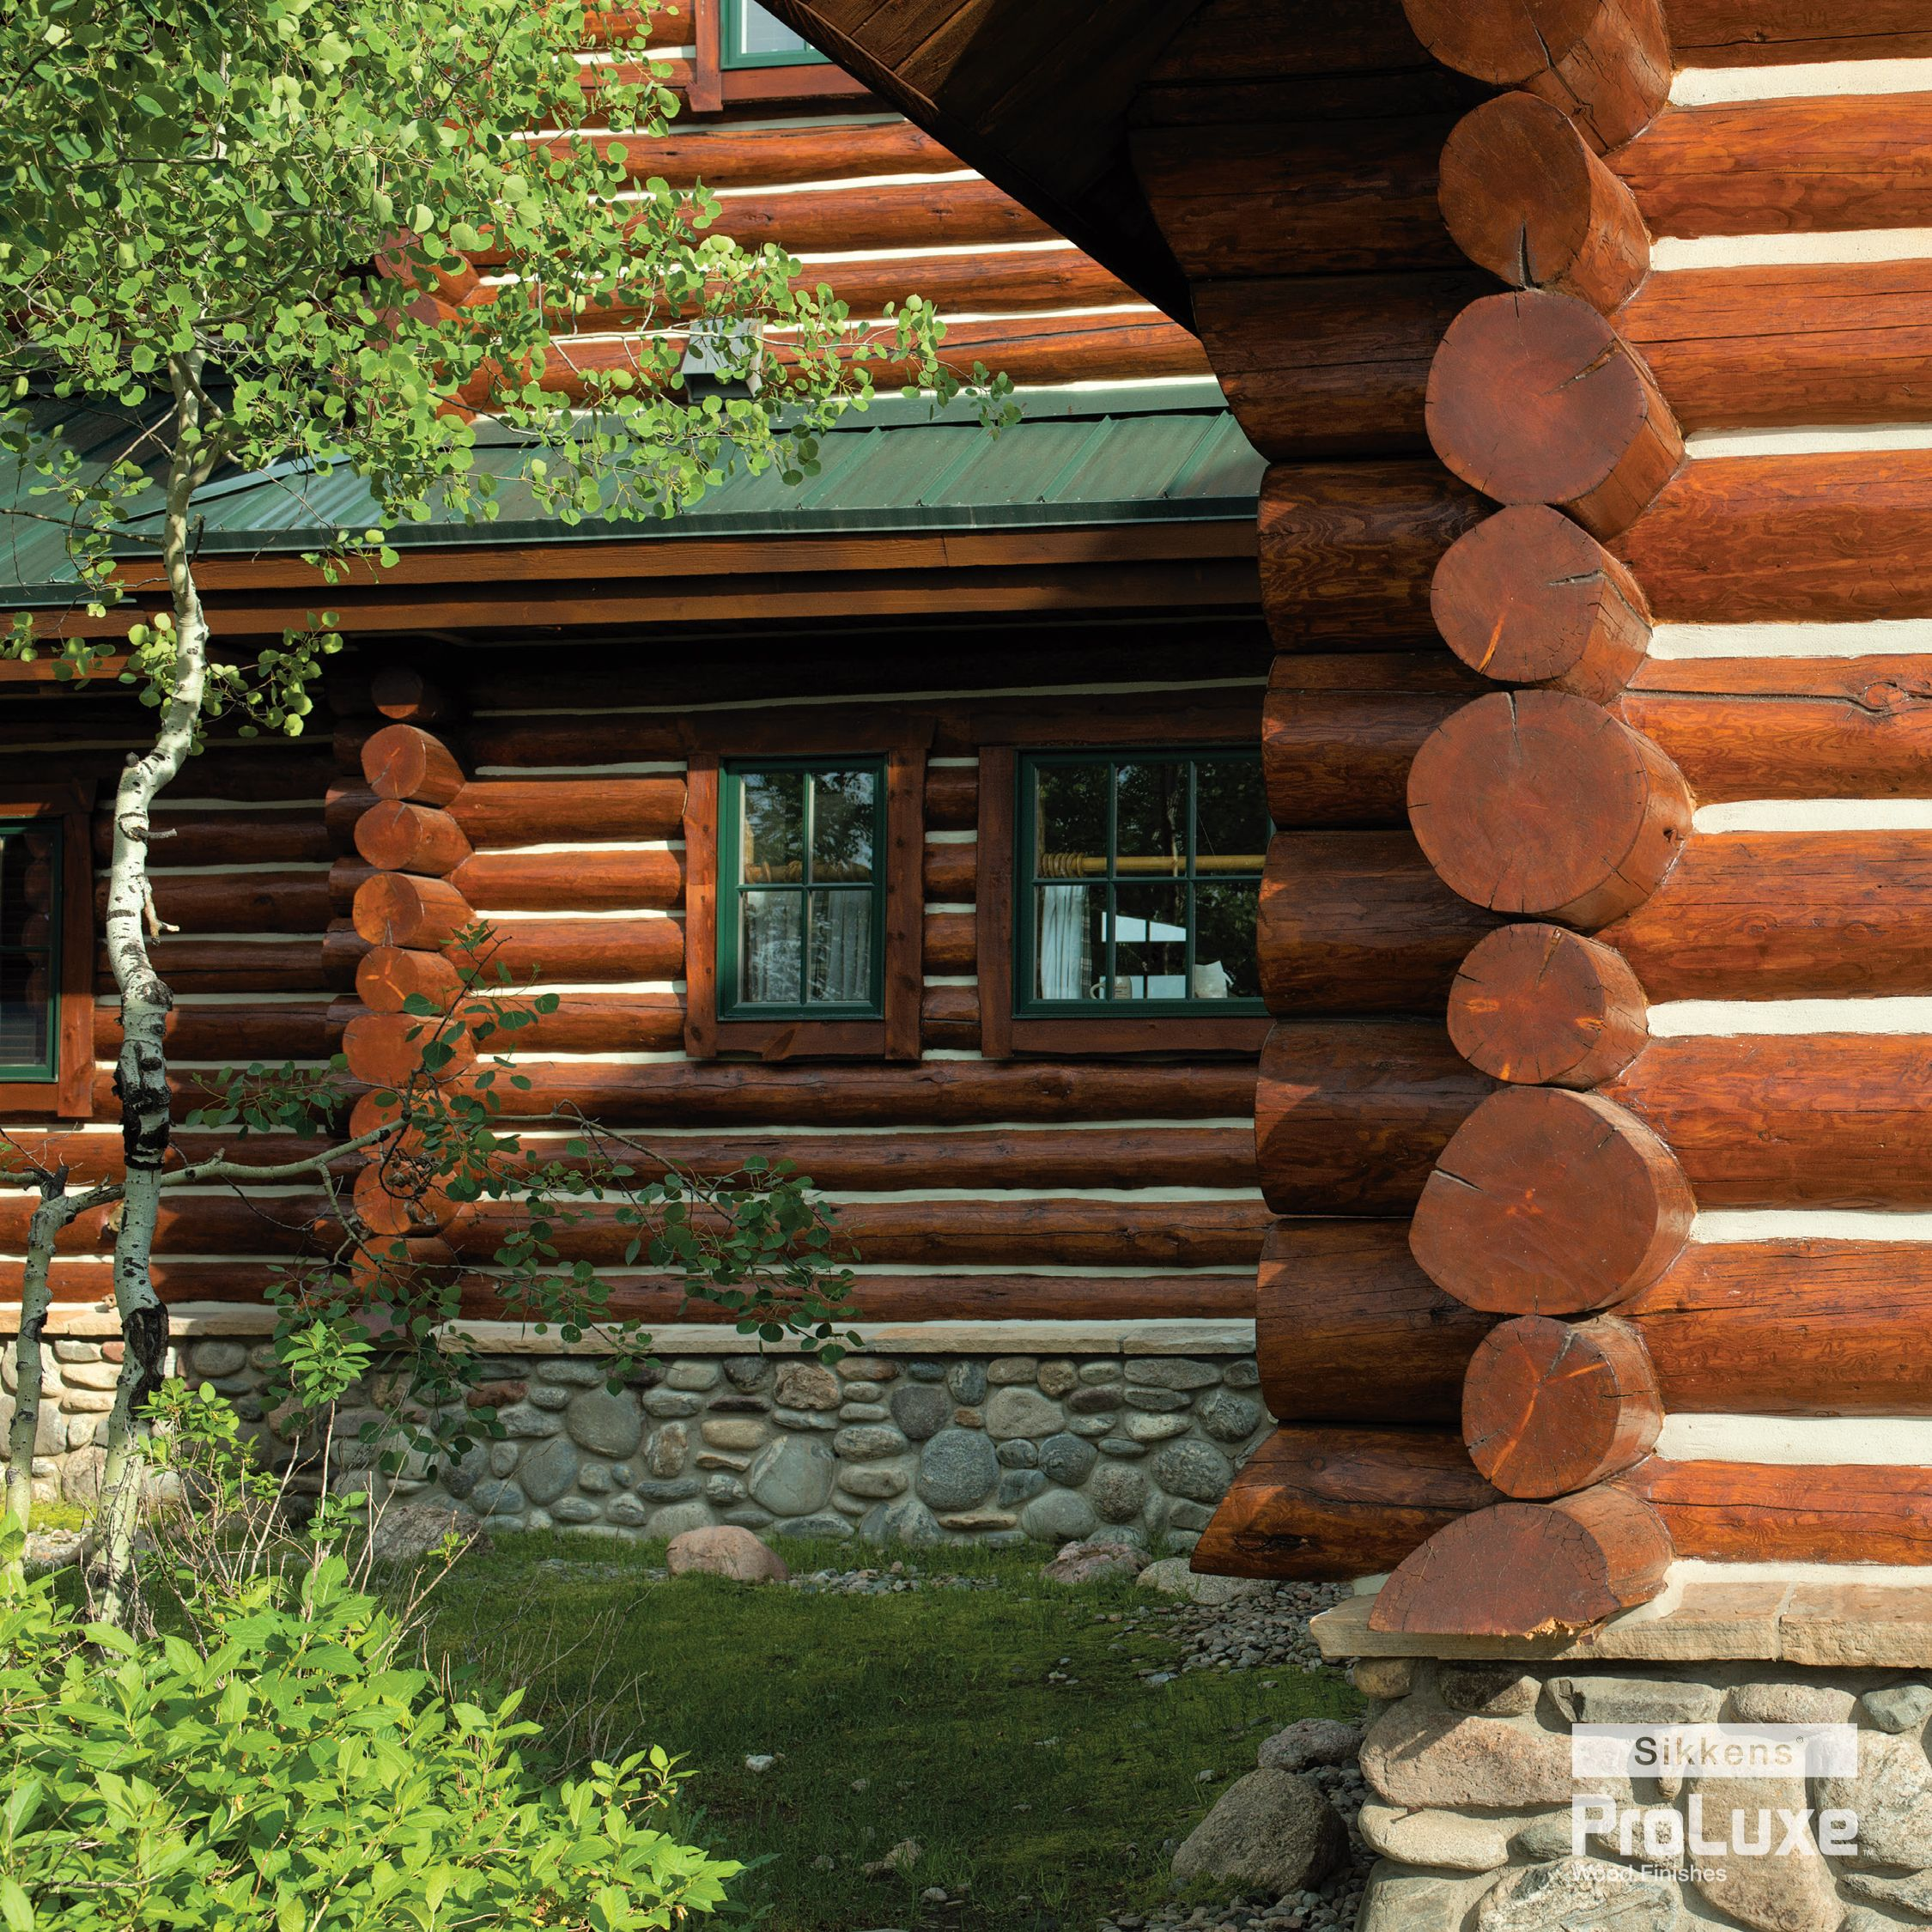 Sikkens 174 Proluxe Cetol 174 Log Amp Siding Wood Finish In Teak